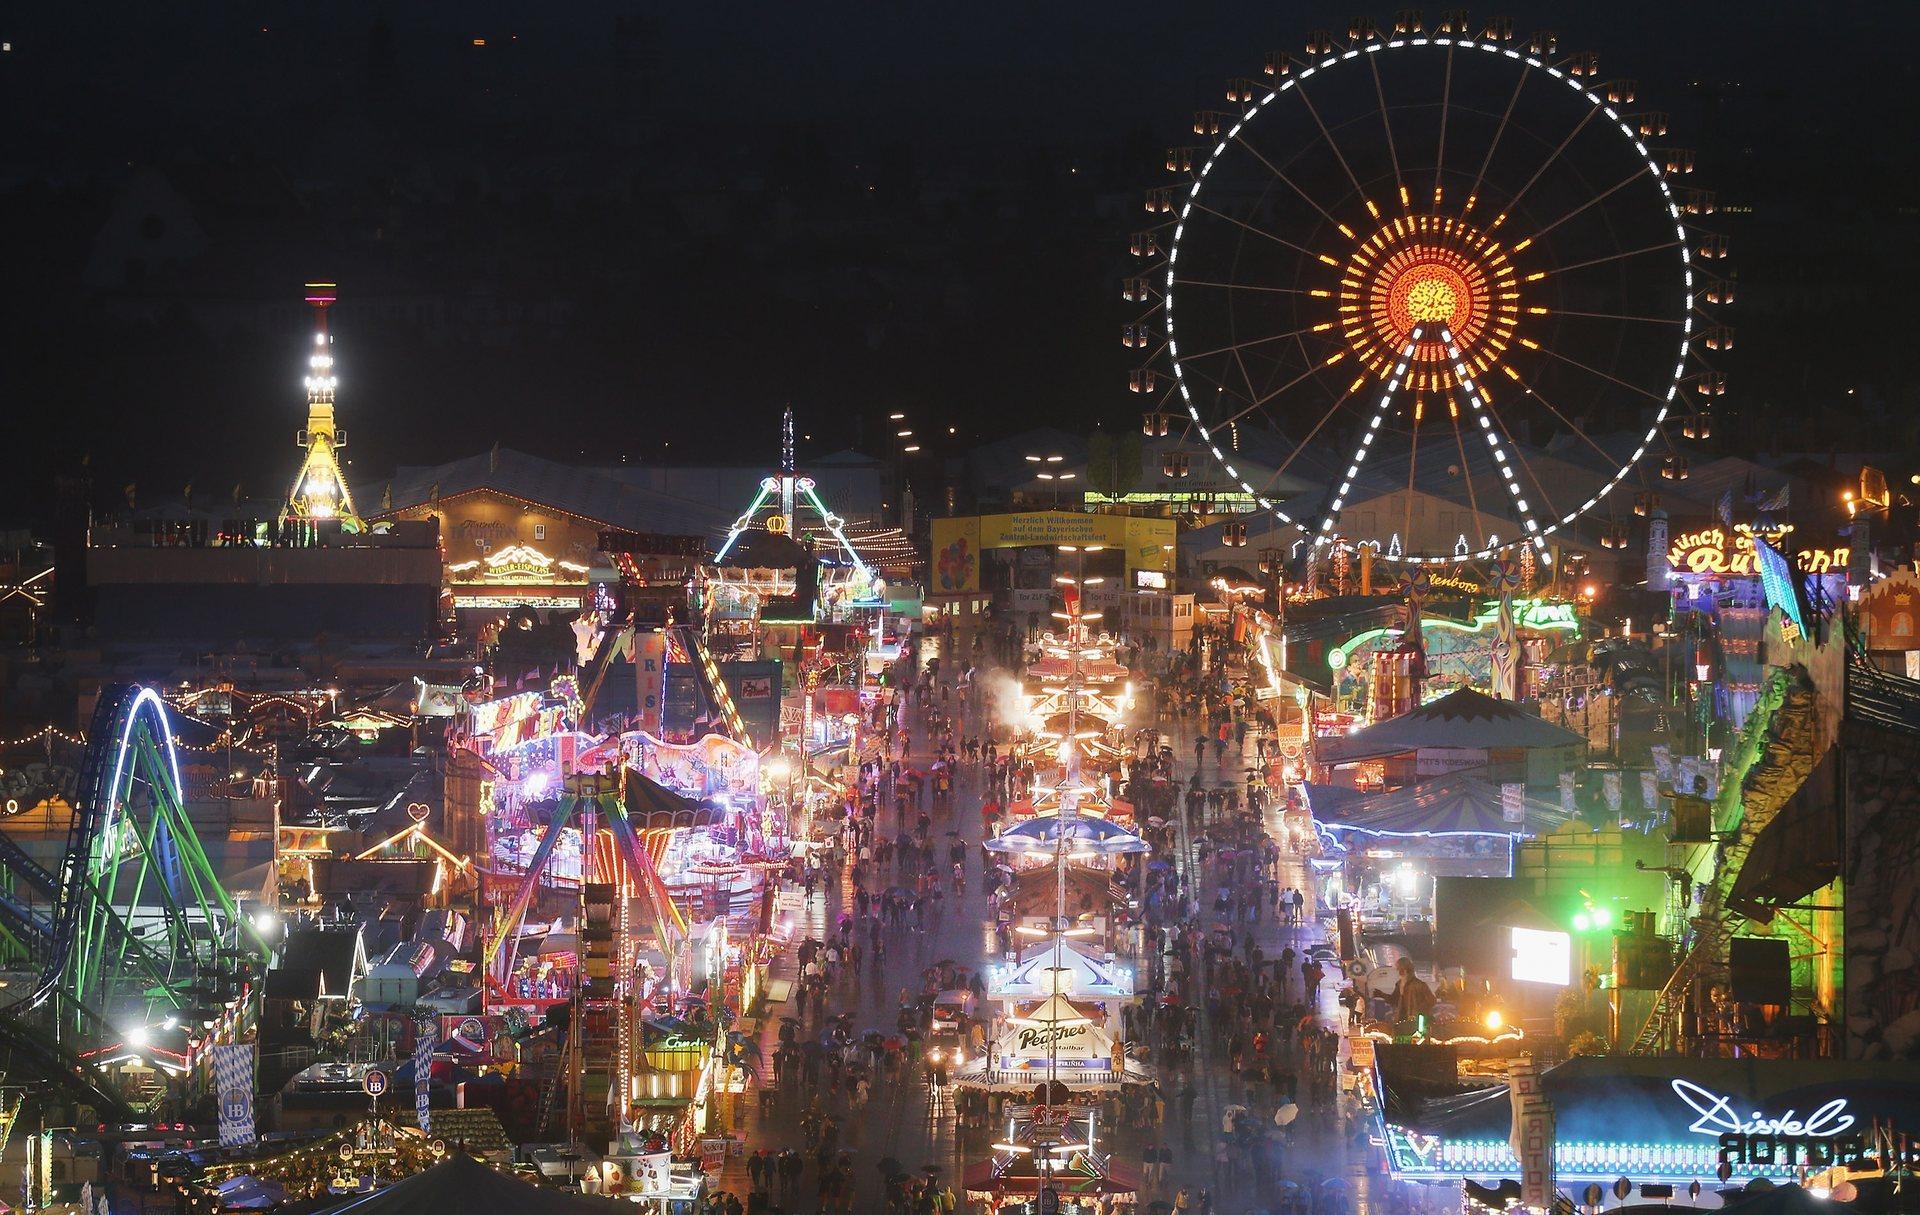 Фестивальная площадка ночью. Фото: Johannes Simon/Getty Images